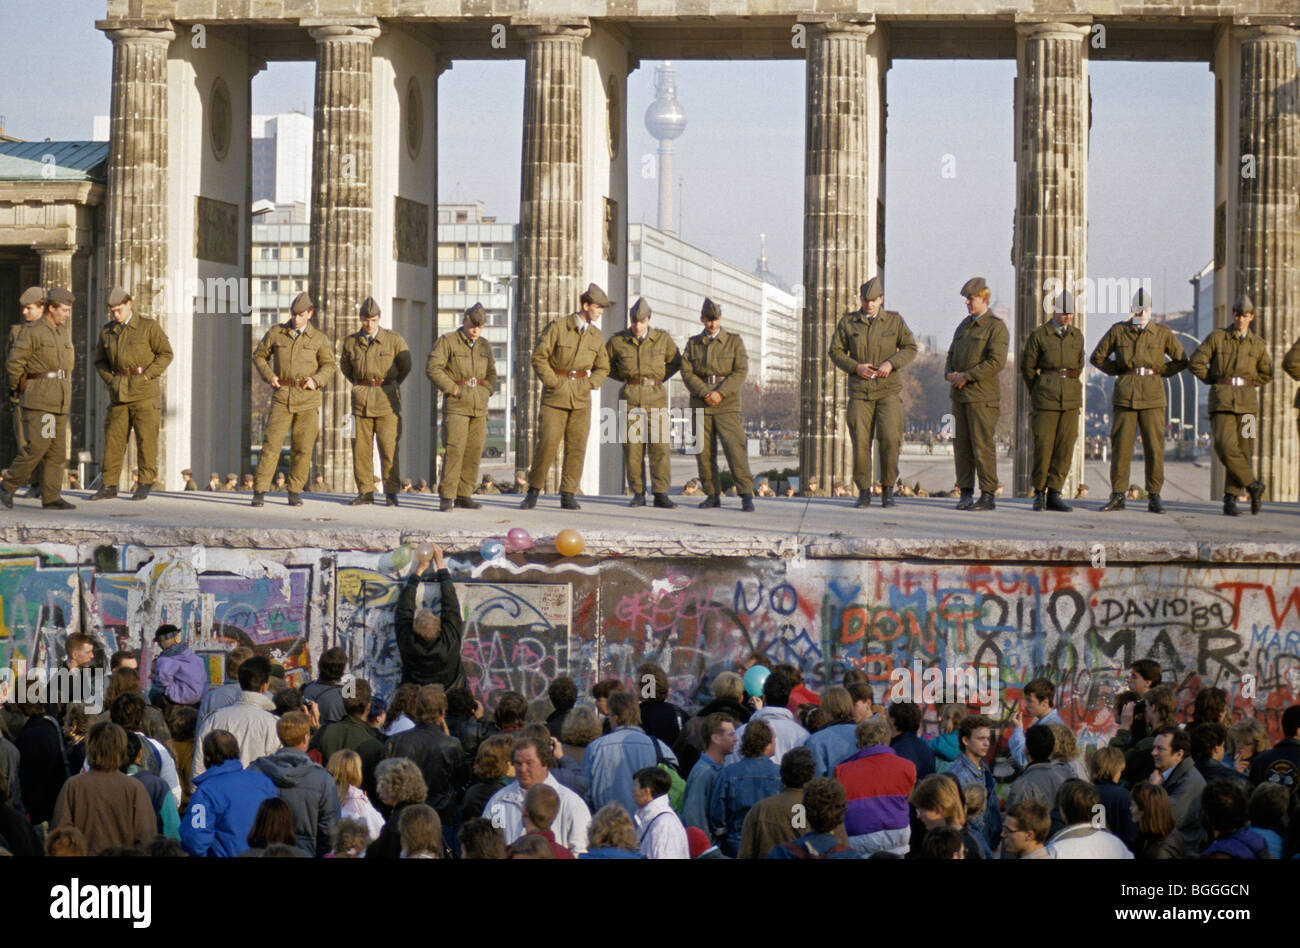 Fall der Berliner Mauer: Soldaten retten die Mauer am Brandenburger Tor, Berlin, Deutschland Stockbild